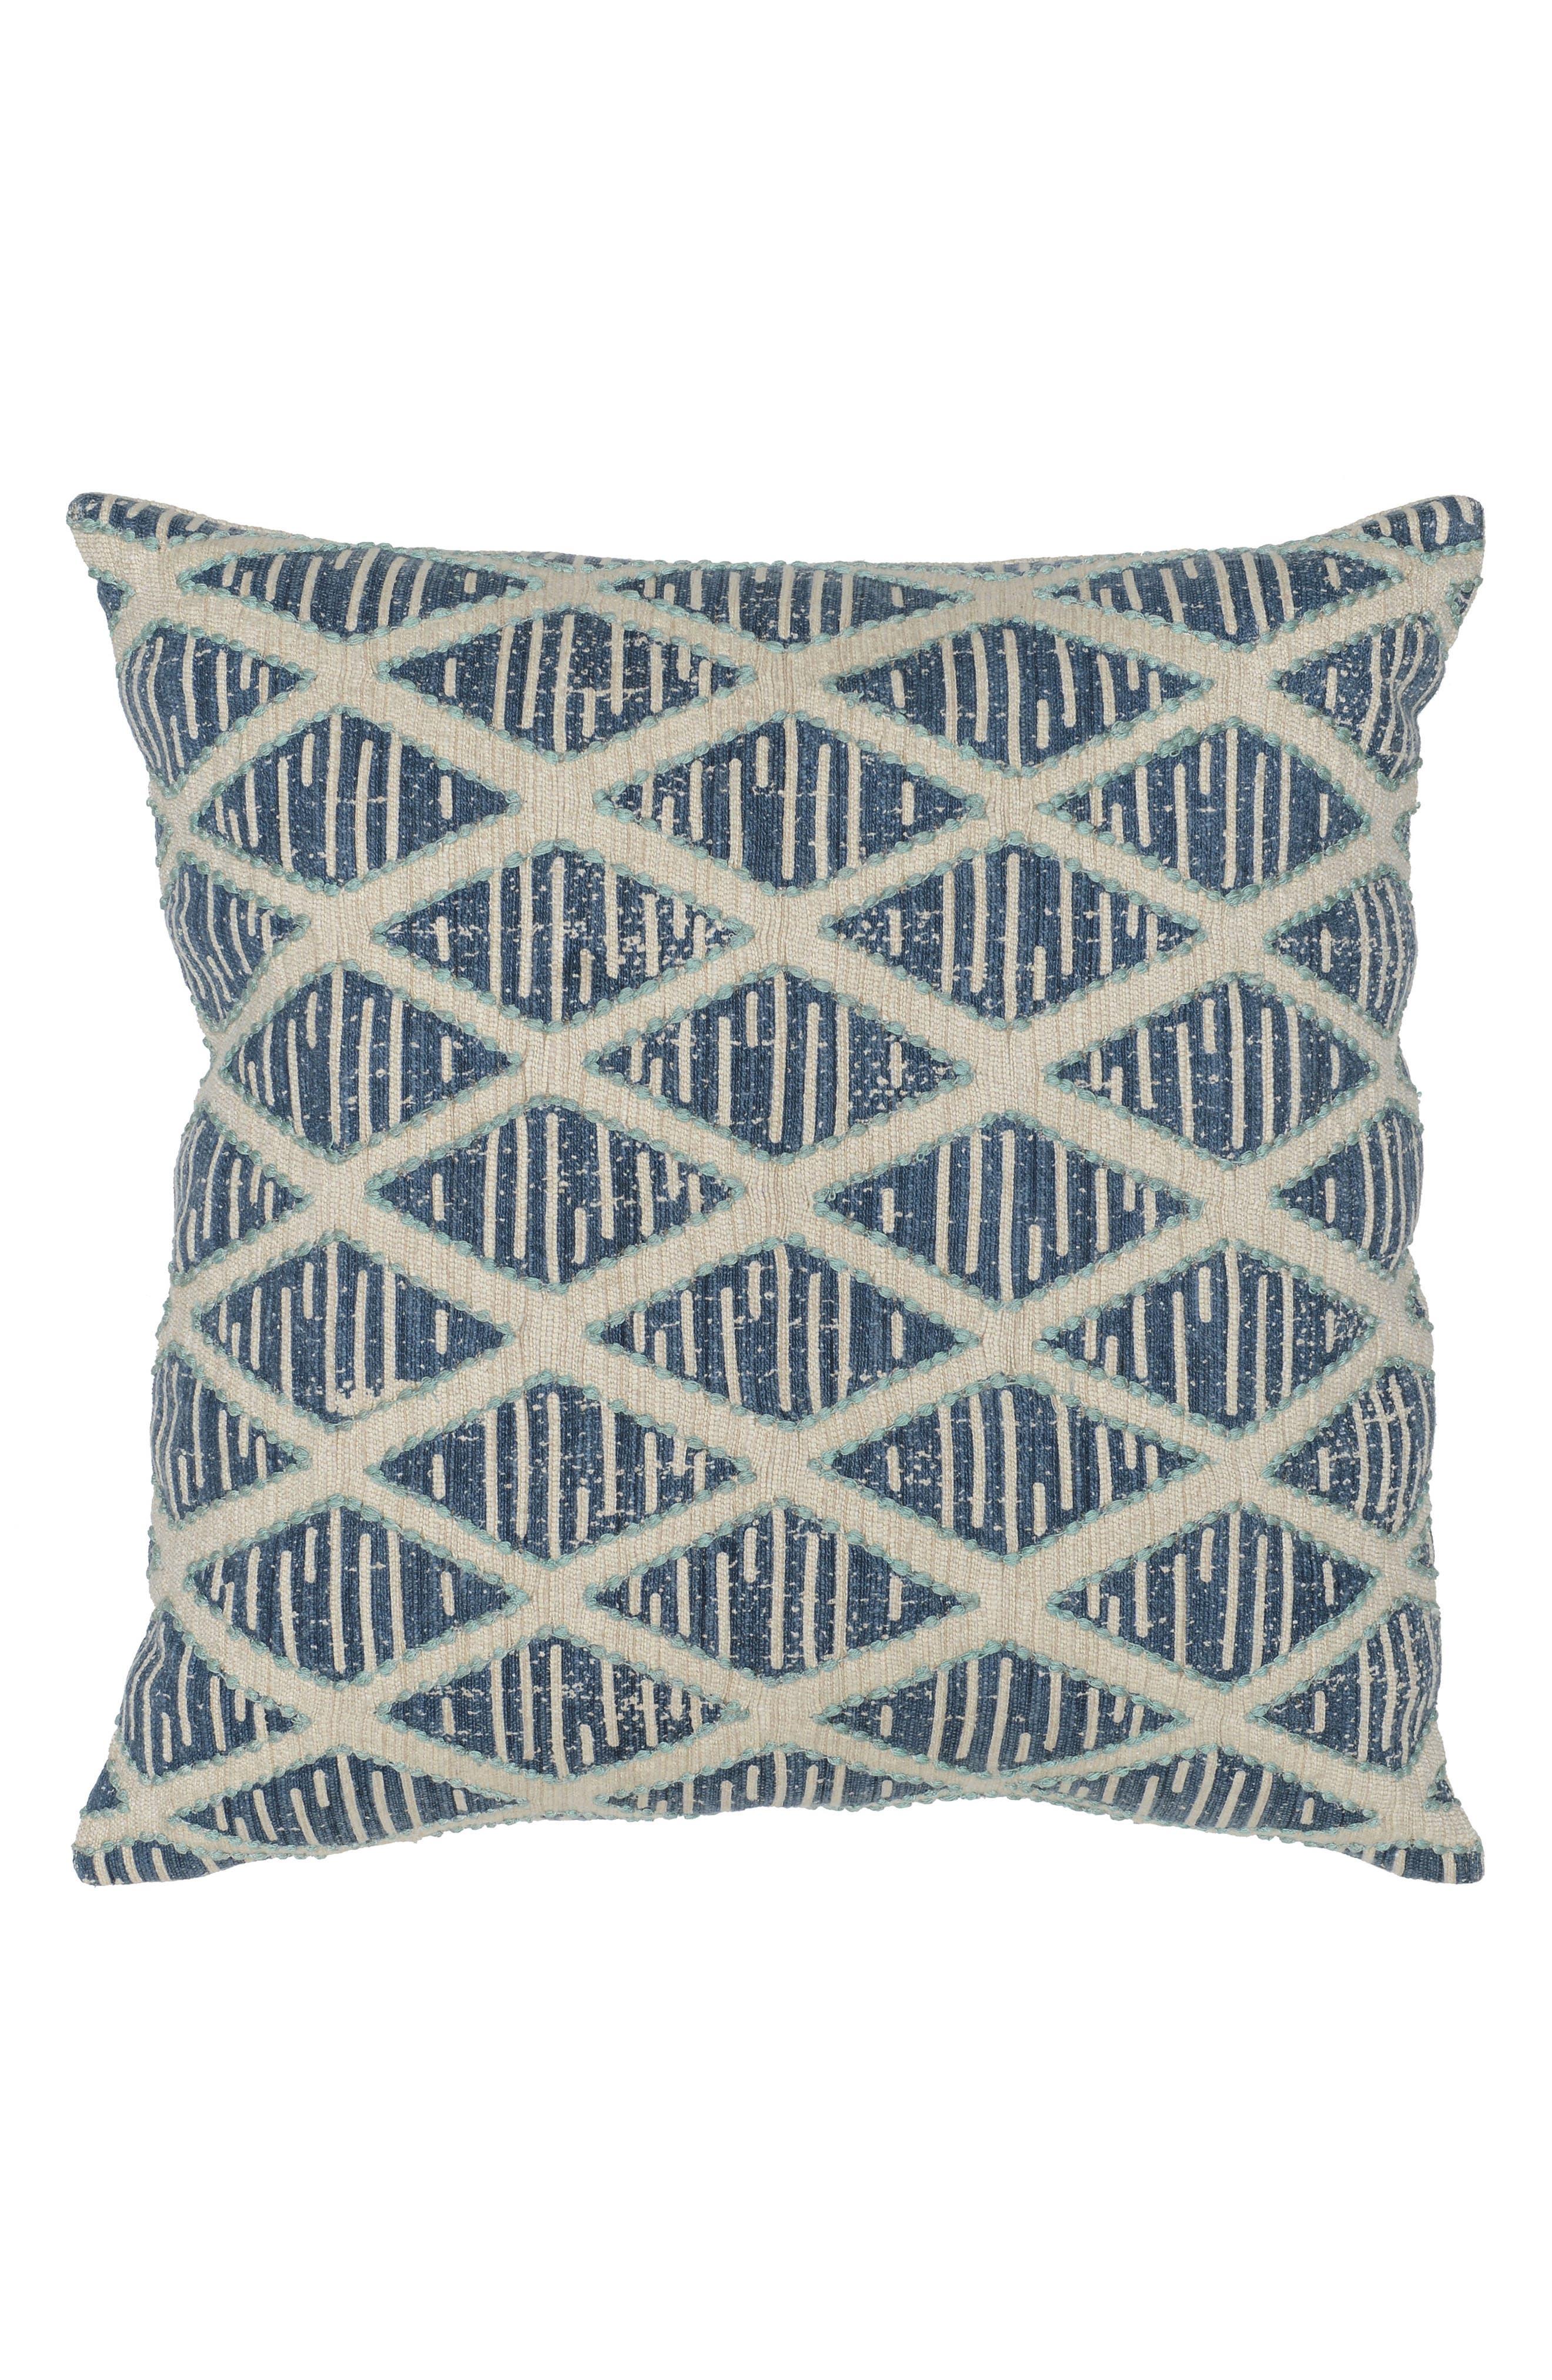 Main Image - Villa Home Collection Atticus Pillow